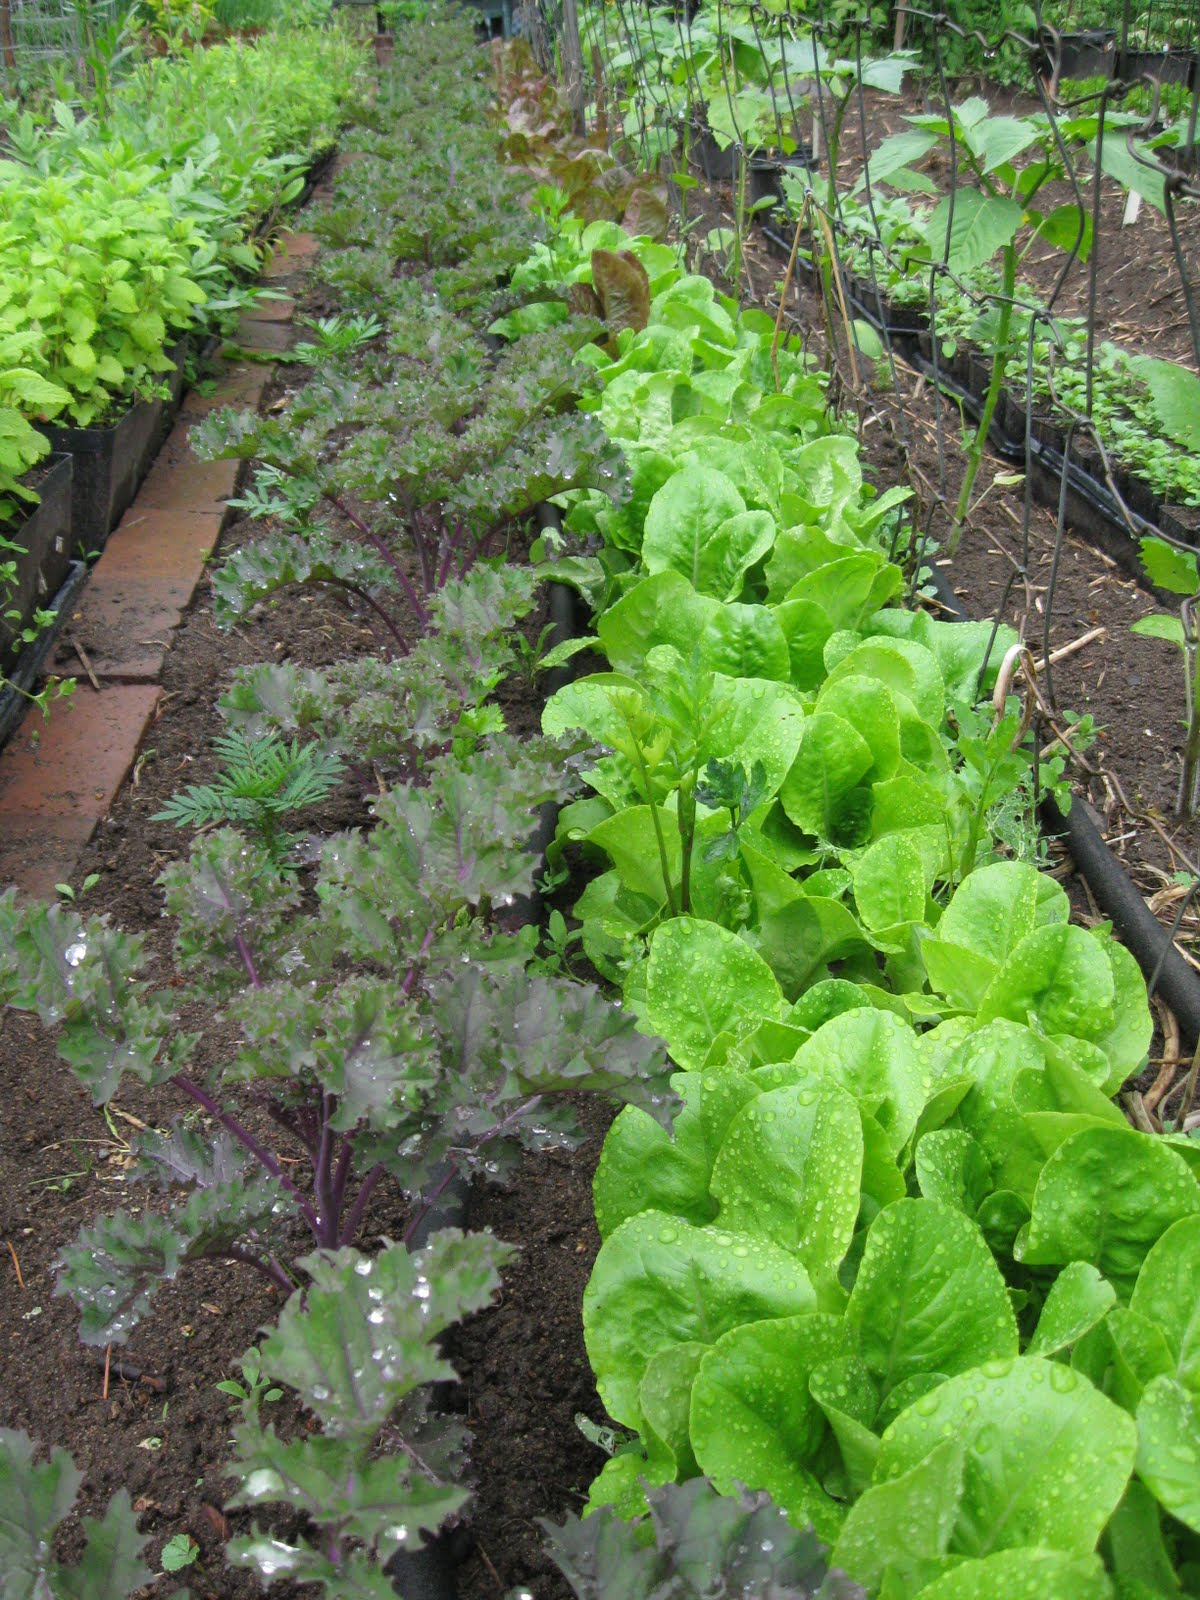 Kgk Gardening Landscape: Our Subsistence Pattern: June 13th Garden Pictures